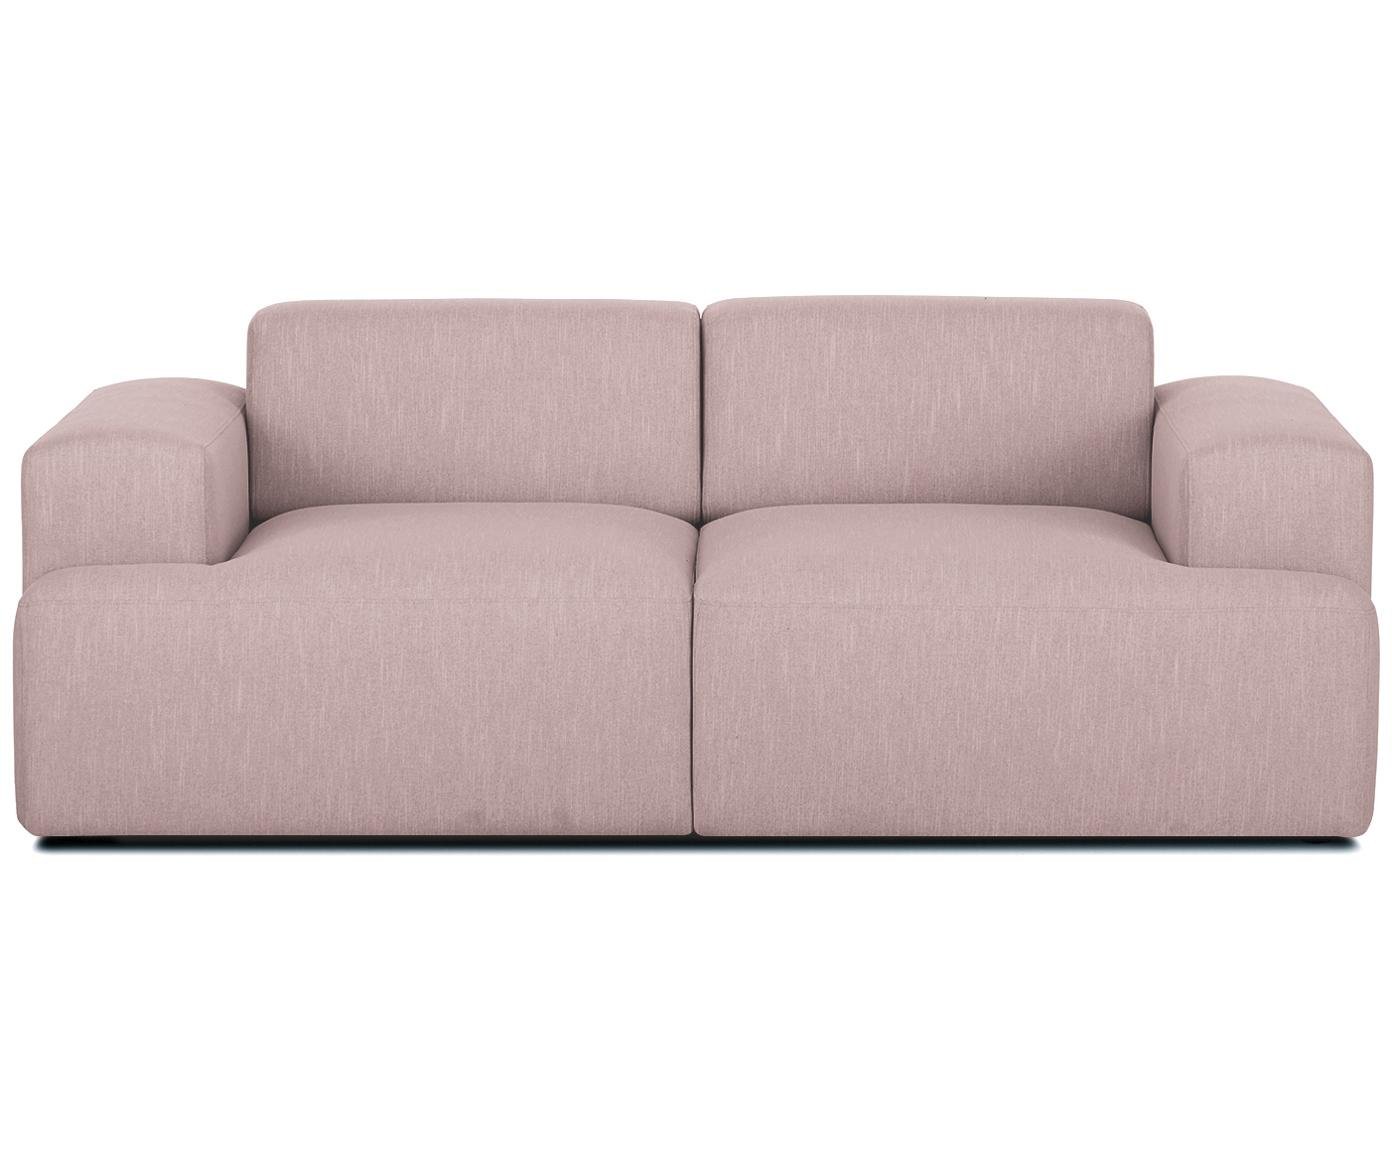 Sofa Melva (2-Sitzer), Bezug: Polyester 35.000 Scheuert, Gestell: Massives Kiefernholz, Spa, Füße: Kiefernholz, Webstoff Rosa, B 200 x T 101 cm